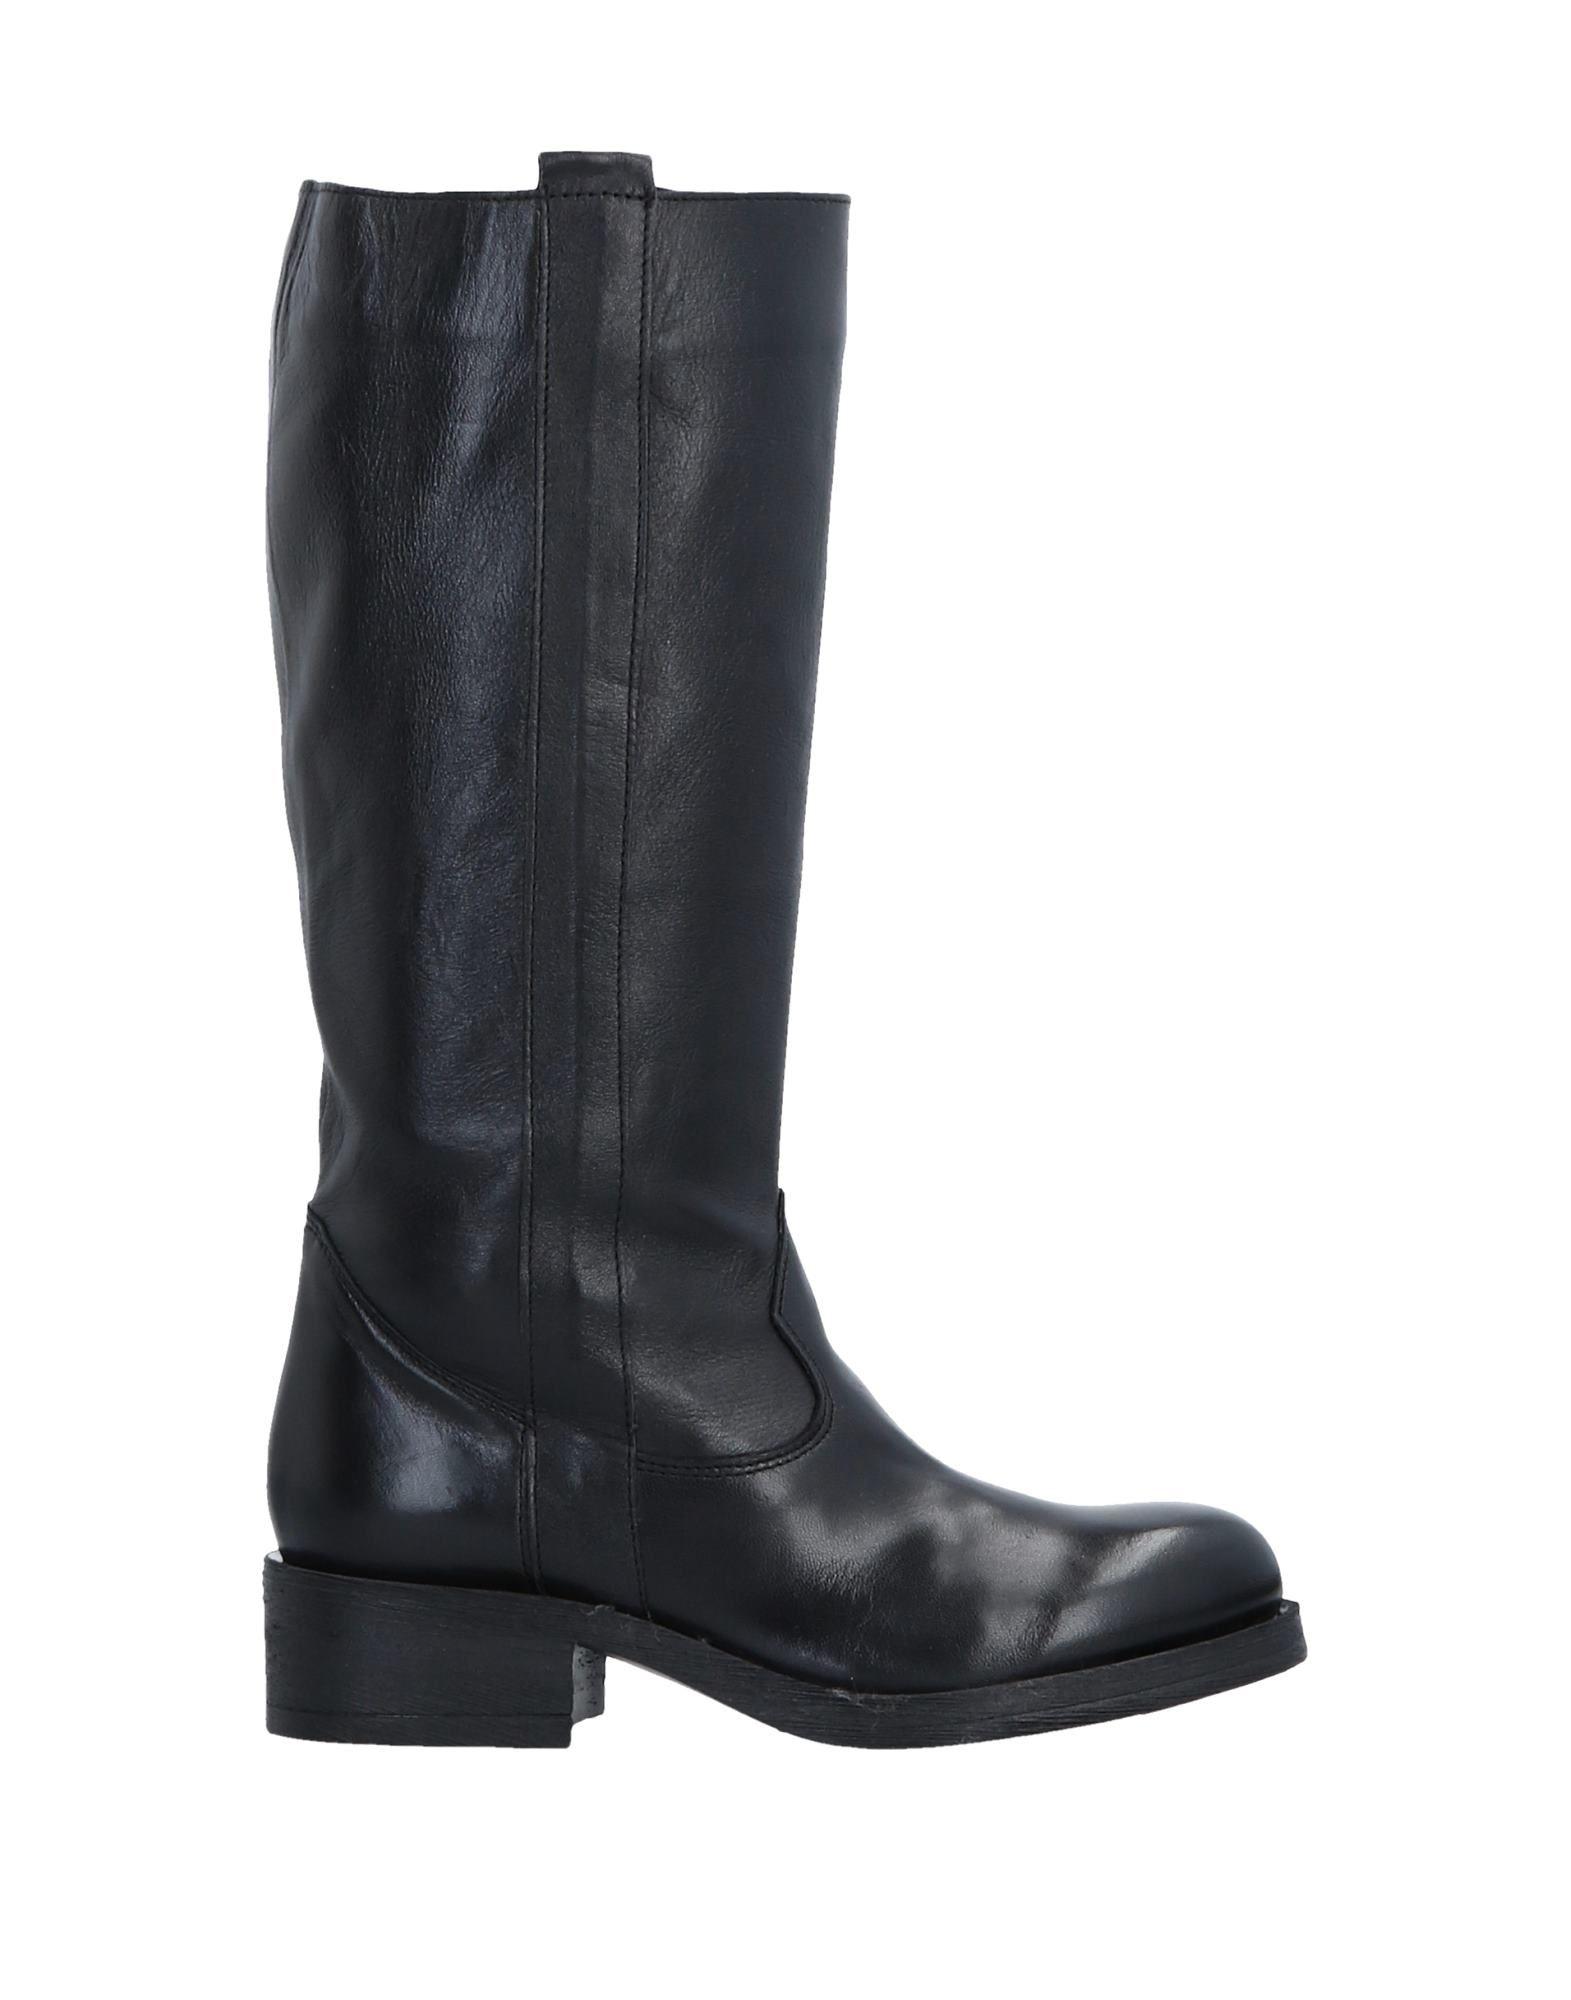 Moda Stivali Unlace Donna - 11522804BF